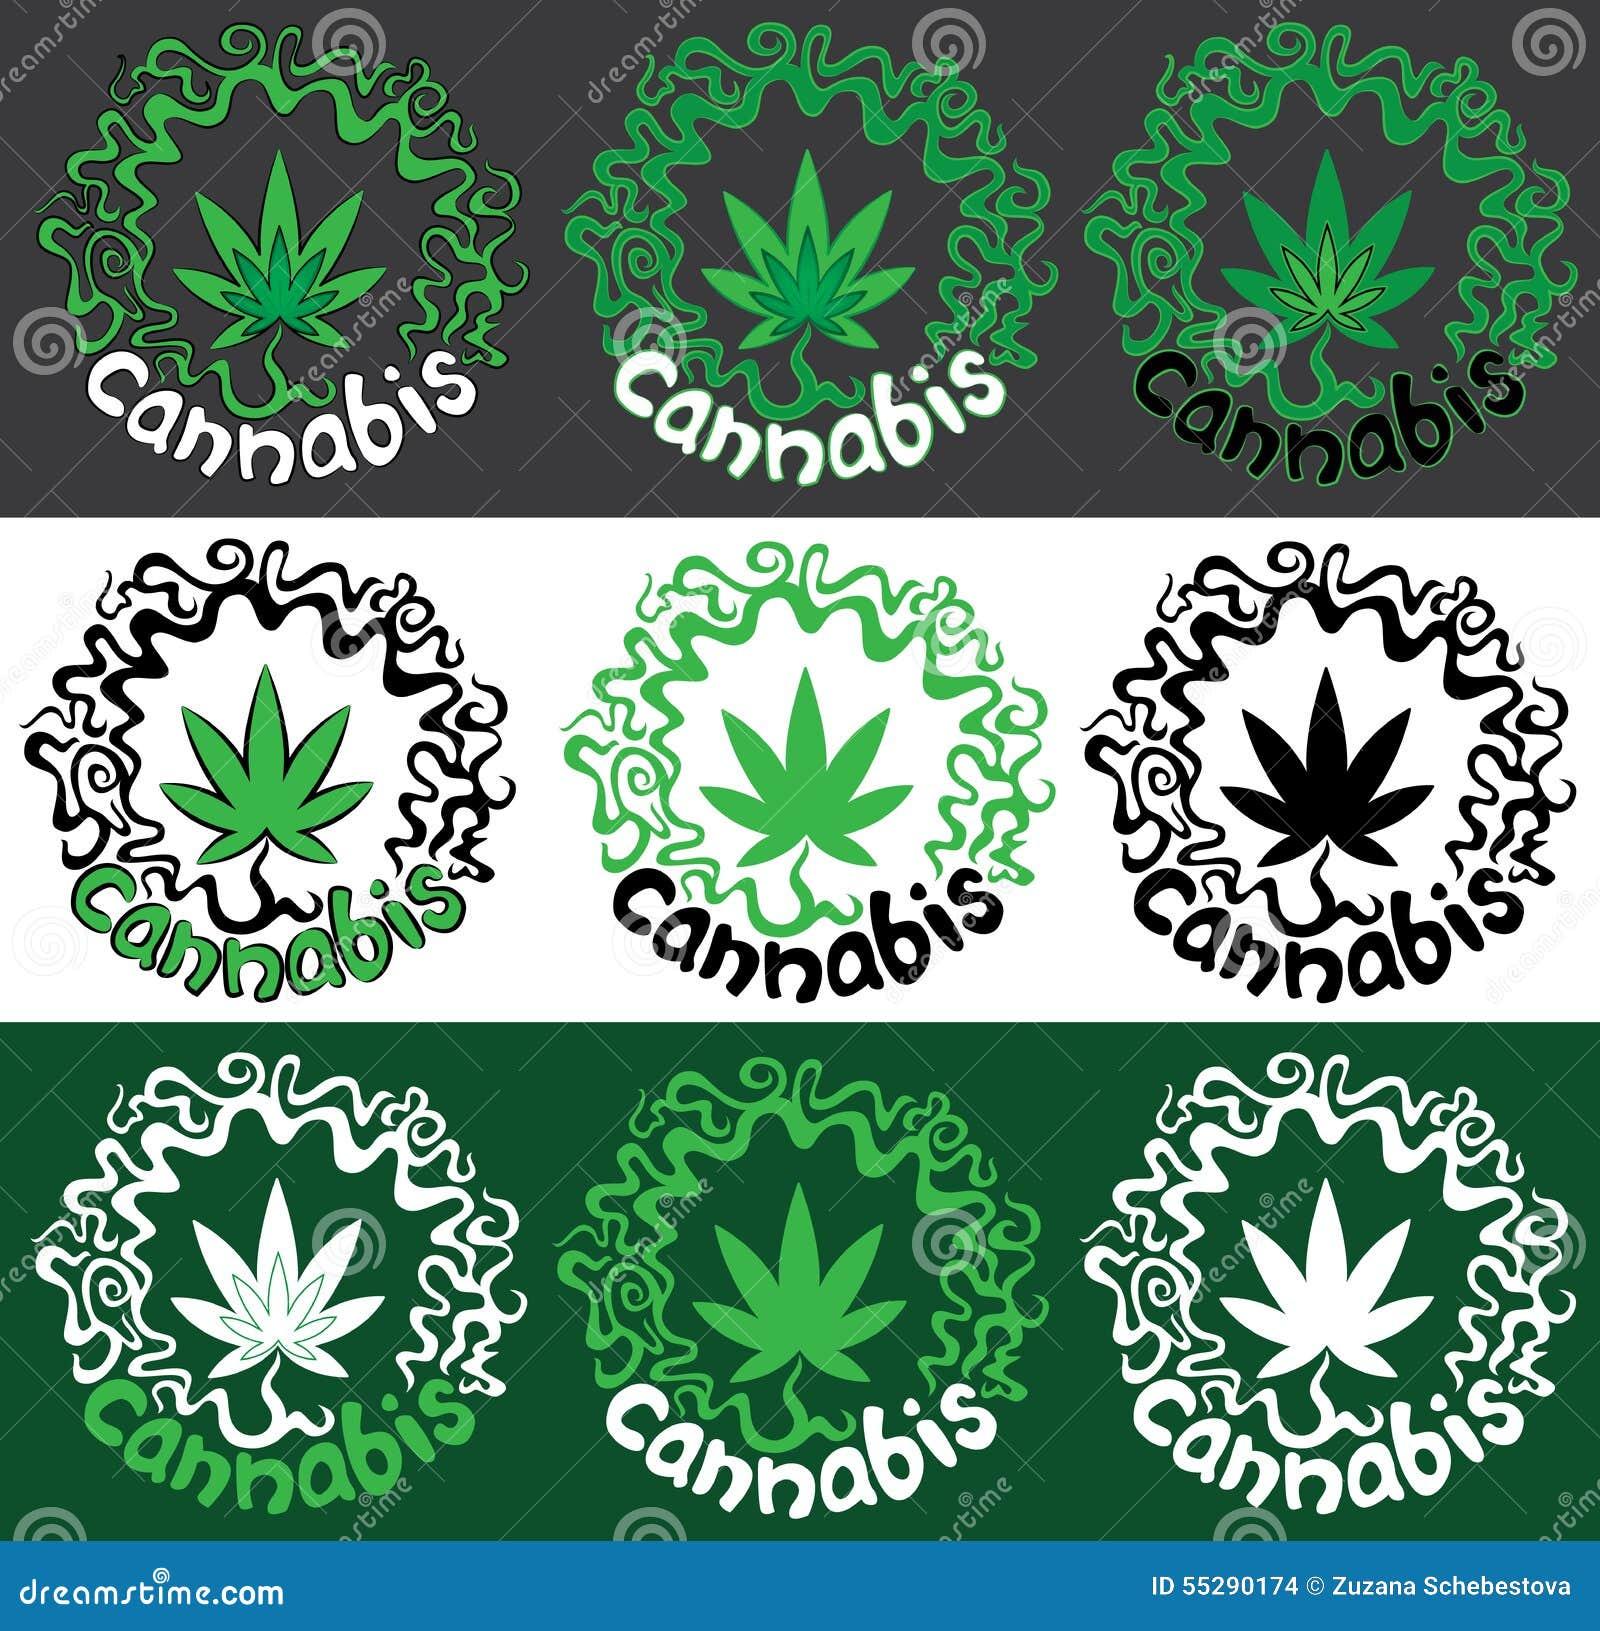 Cannabis marijuana leaf design symbol stamp illustration stock cannabis marijuana leaf design symbol stamp illustration biocorpaavc